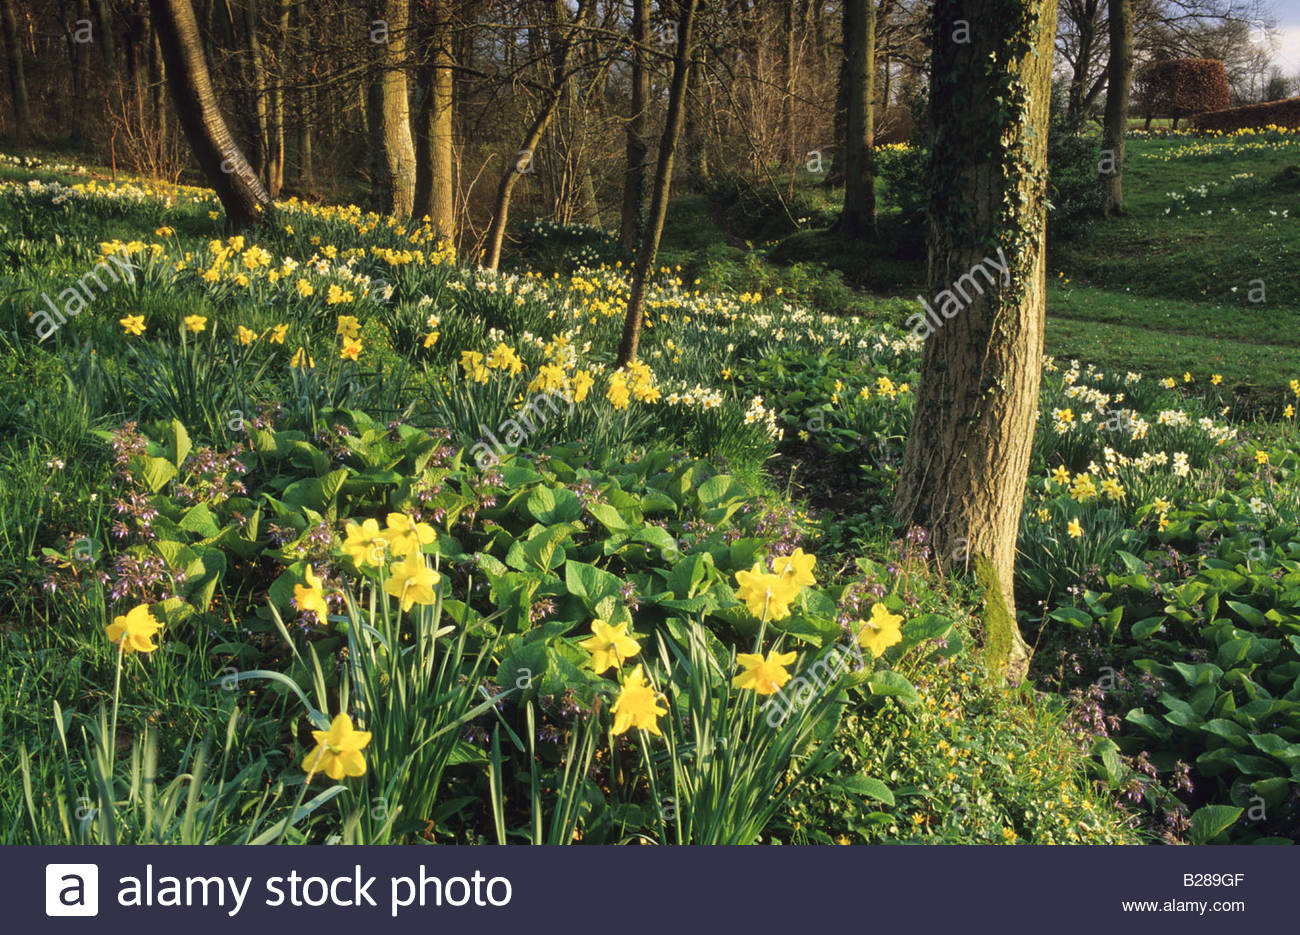 Vann Surrey Mixed Daffodils In Spring Woodland Garden Wood Flowers